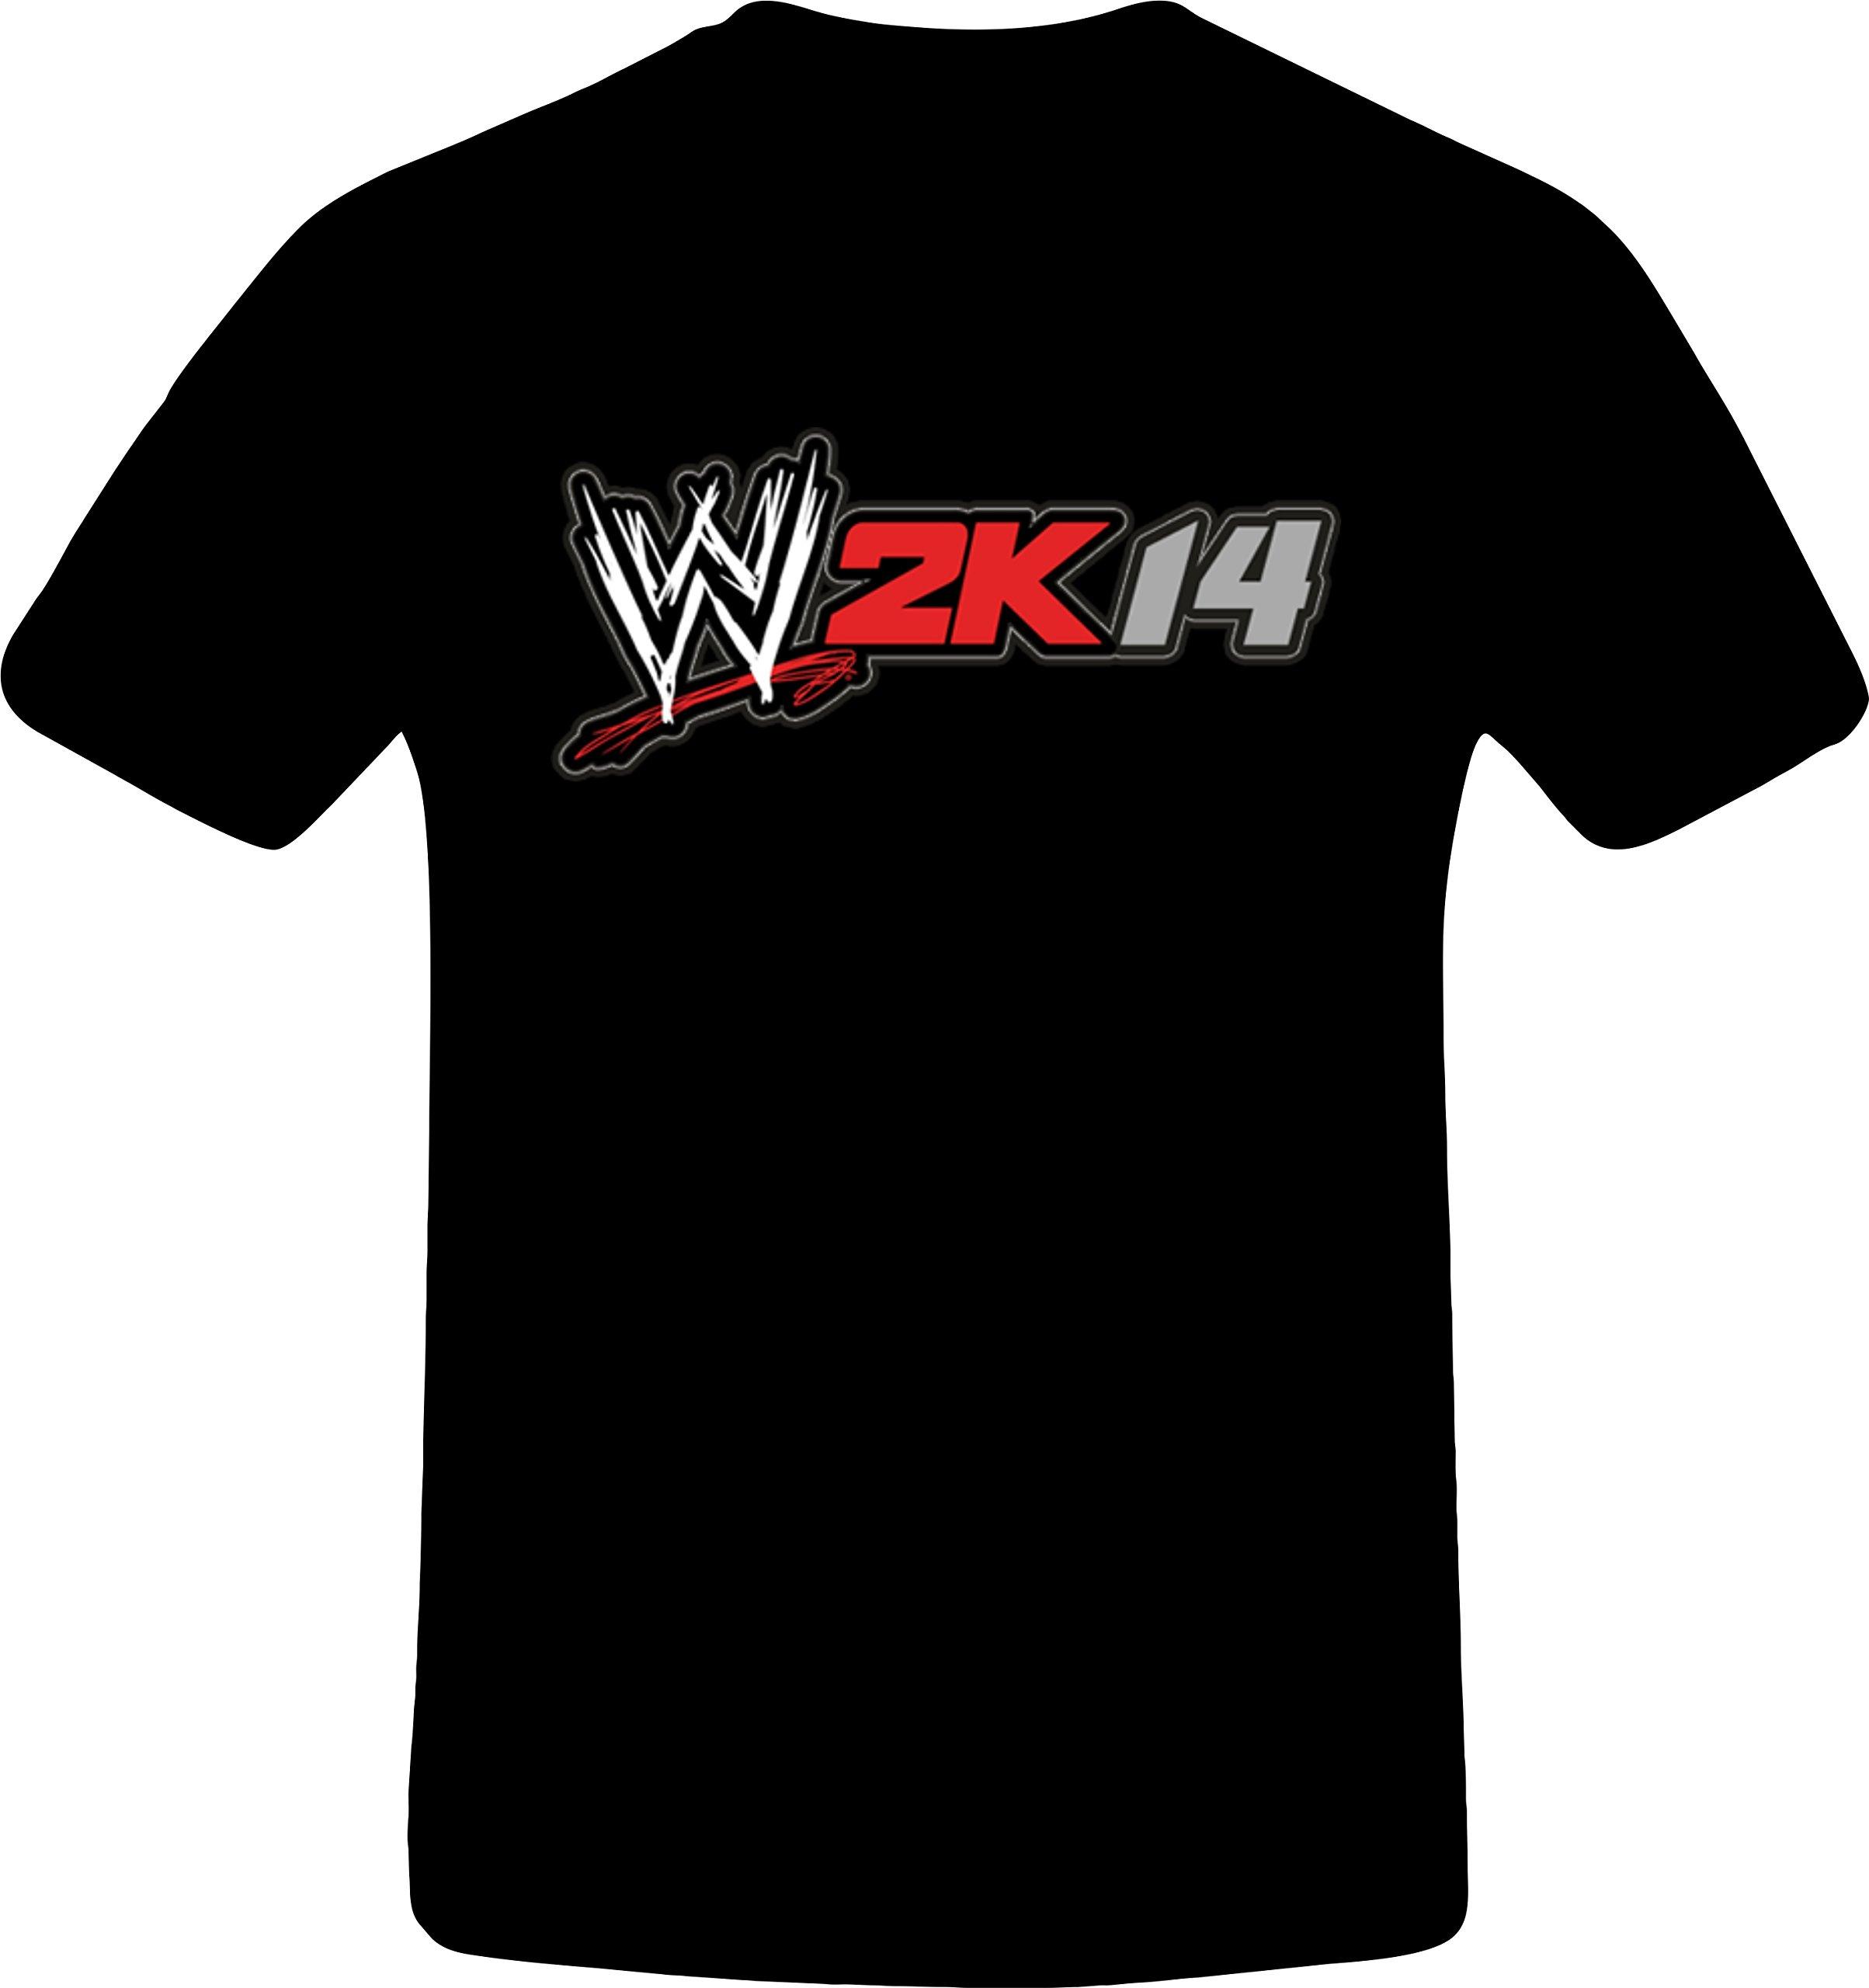 W 2K14 Wrestling - Best Quality Costum Tshirt (5XL, BLACK)